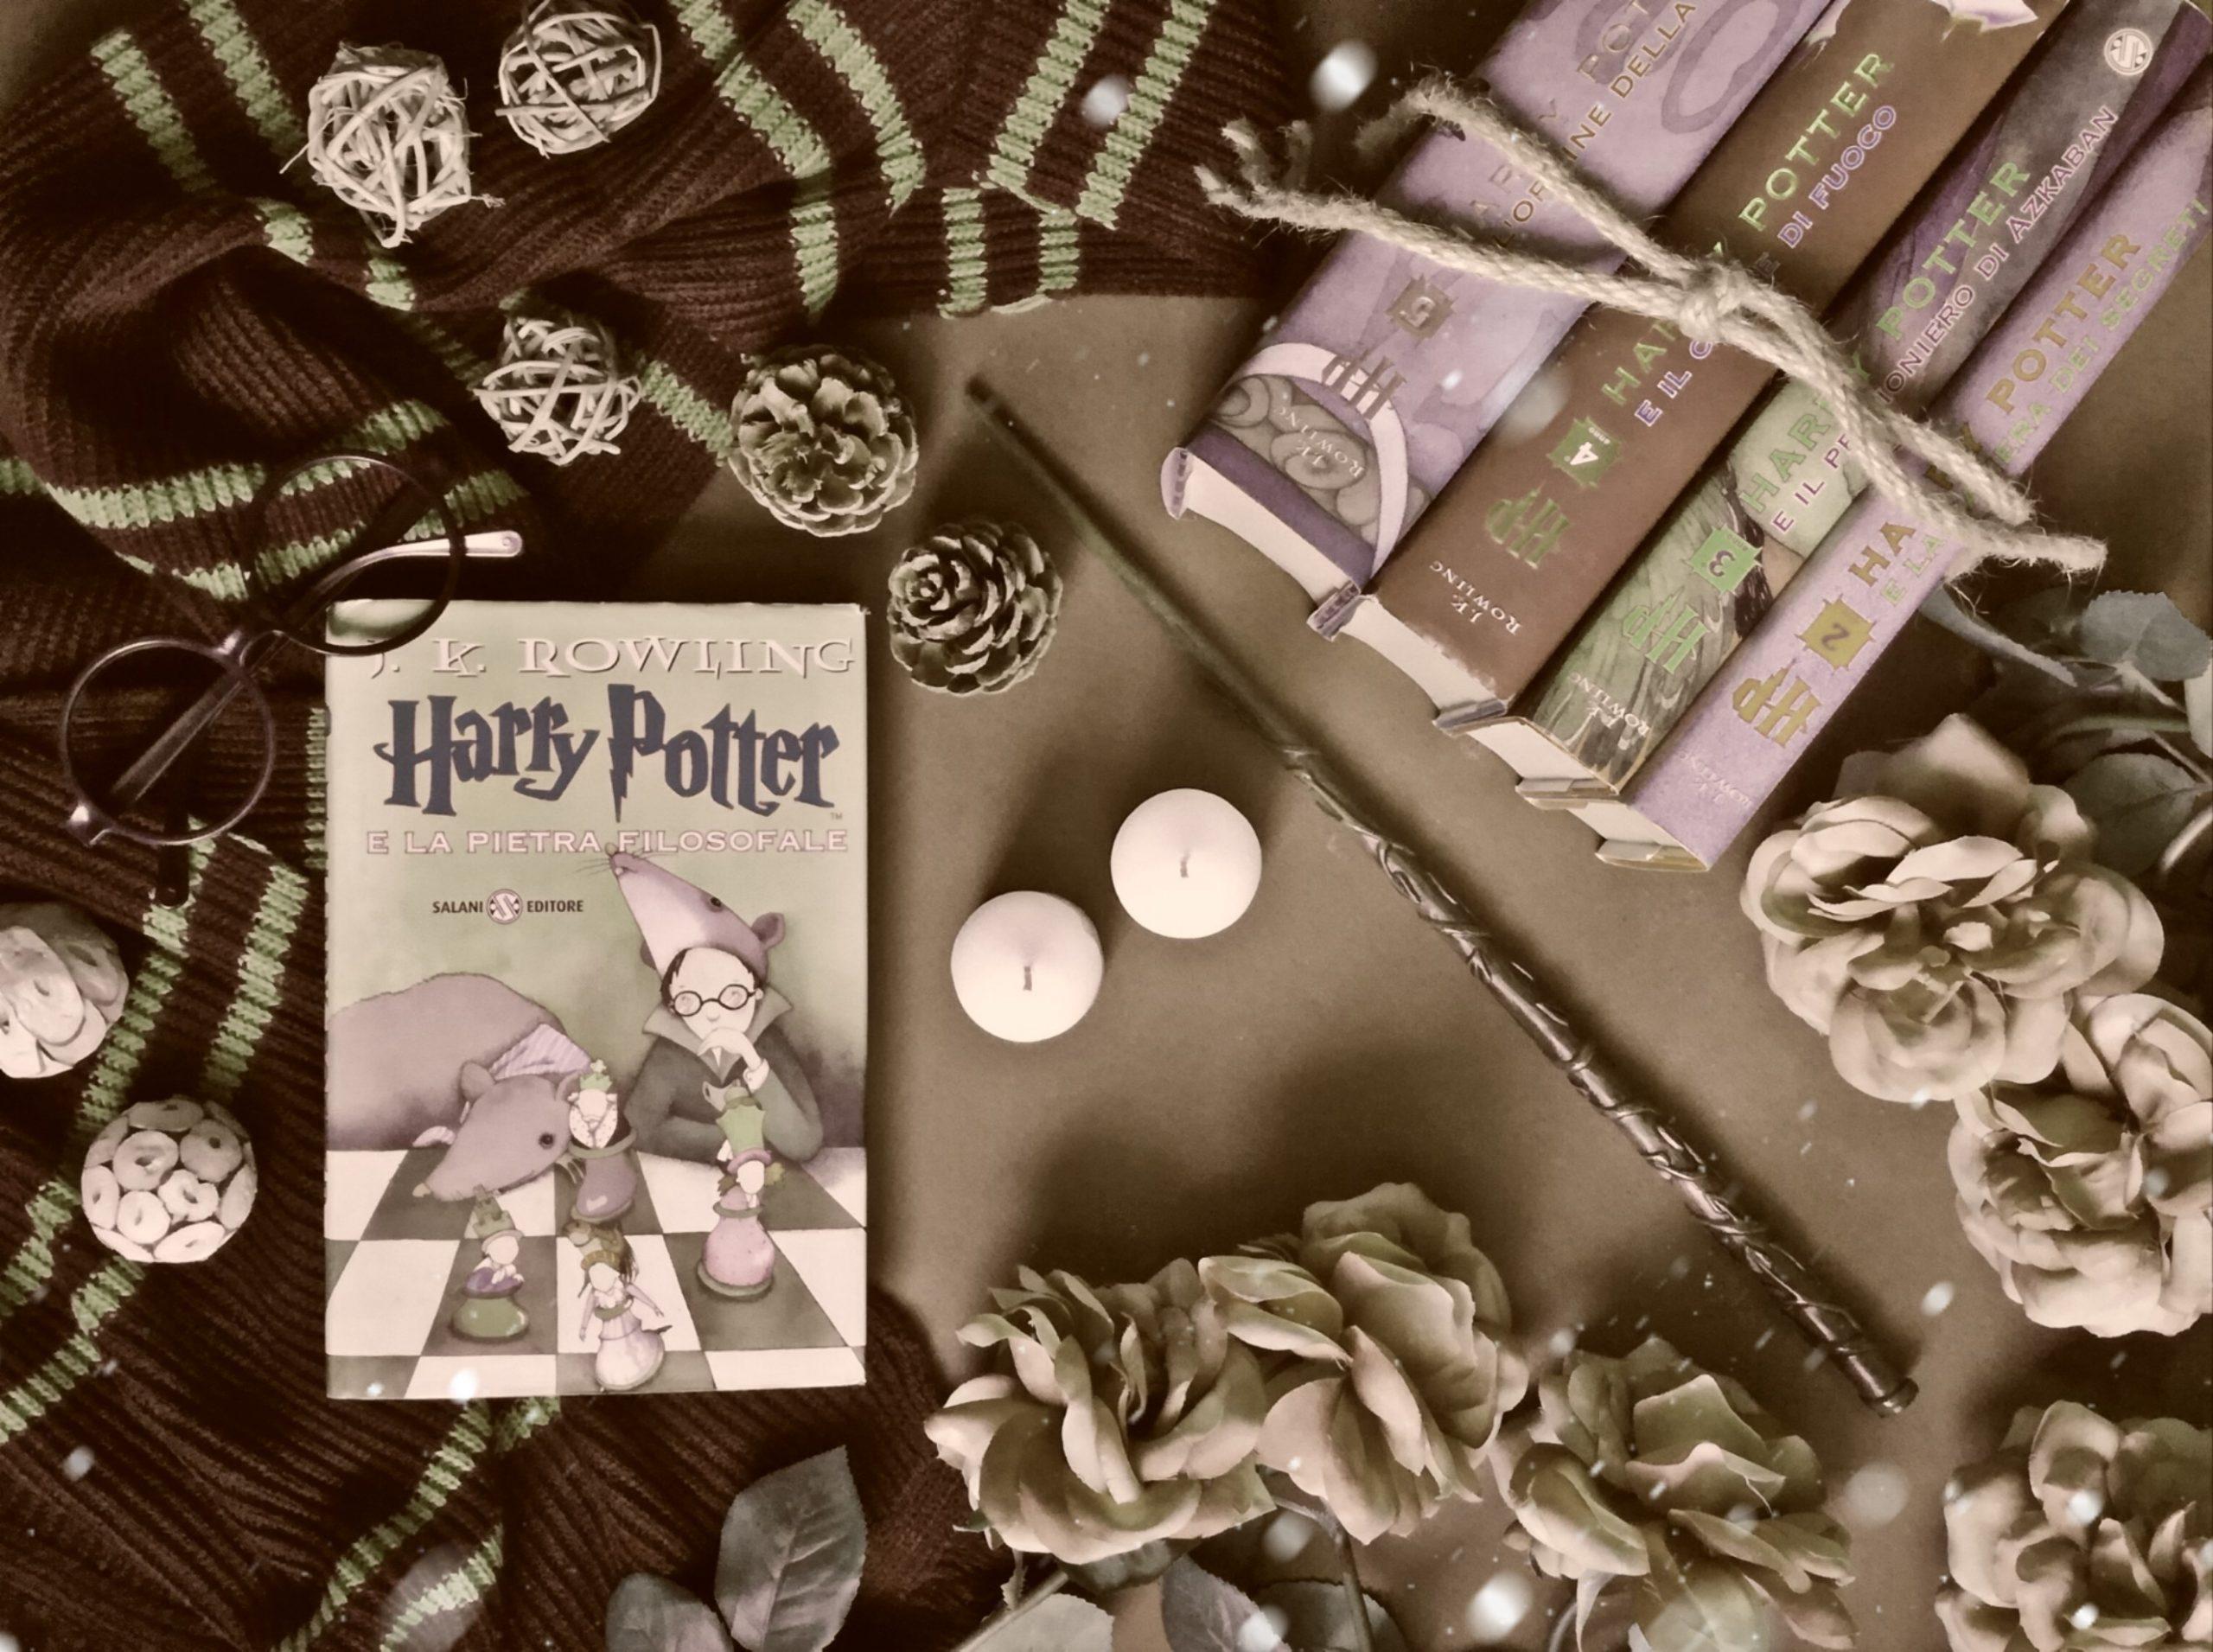 Harry Potter e la pietra filosofale – J. K. Rowling